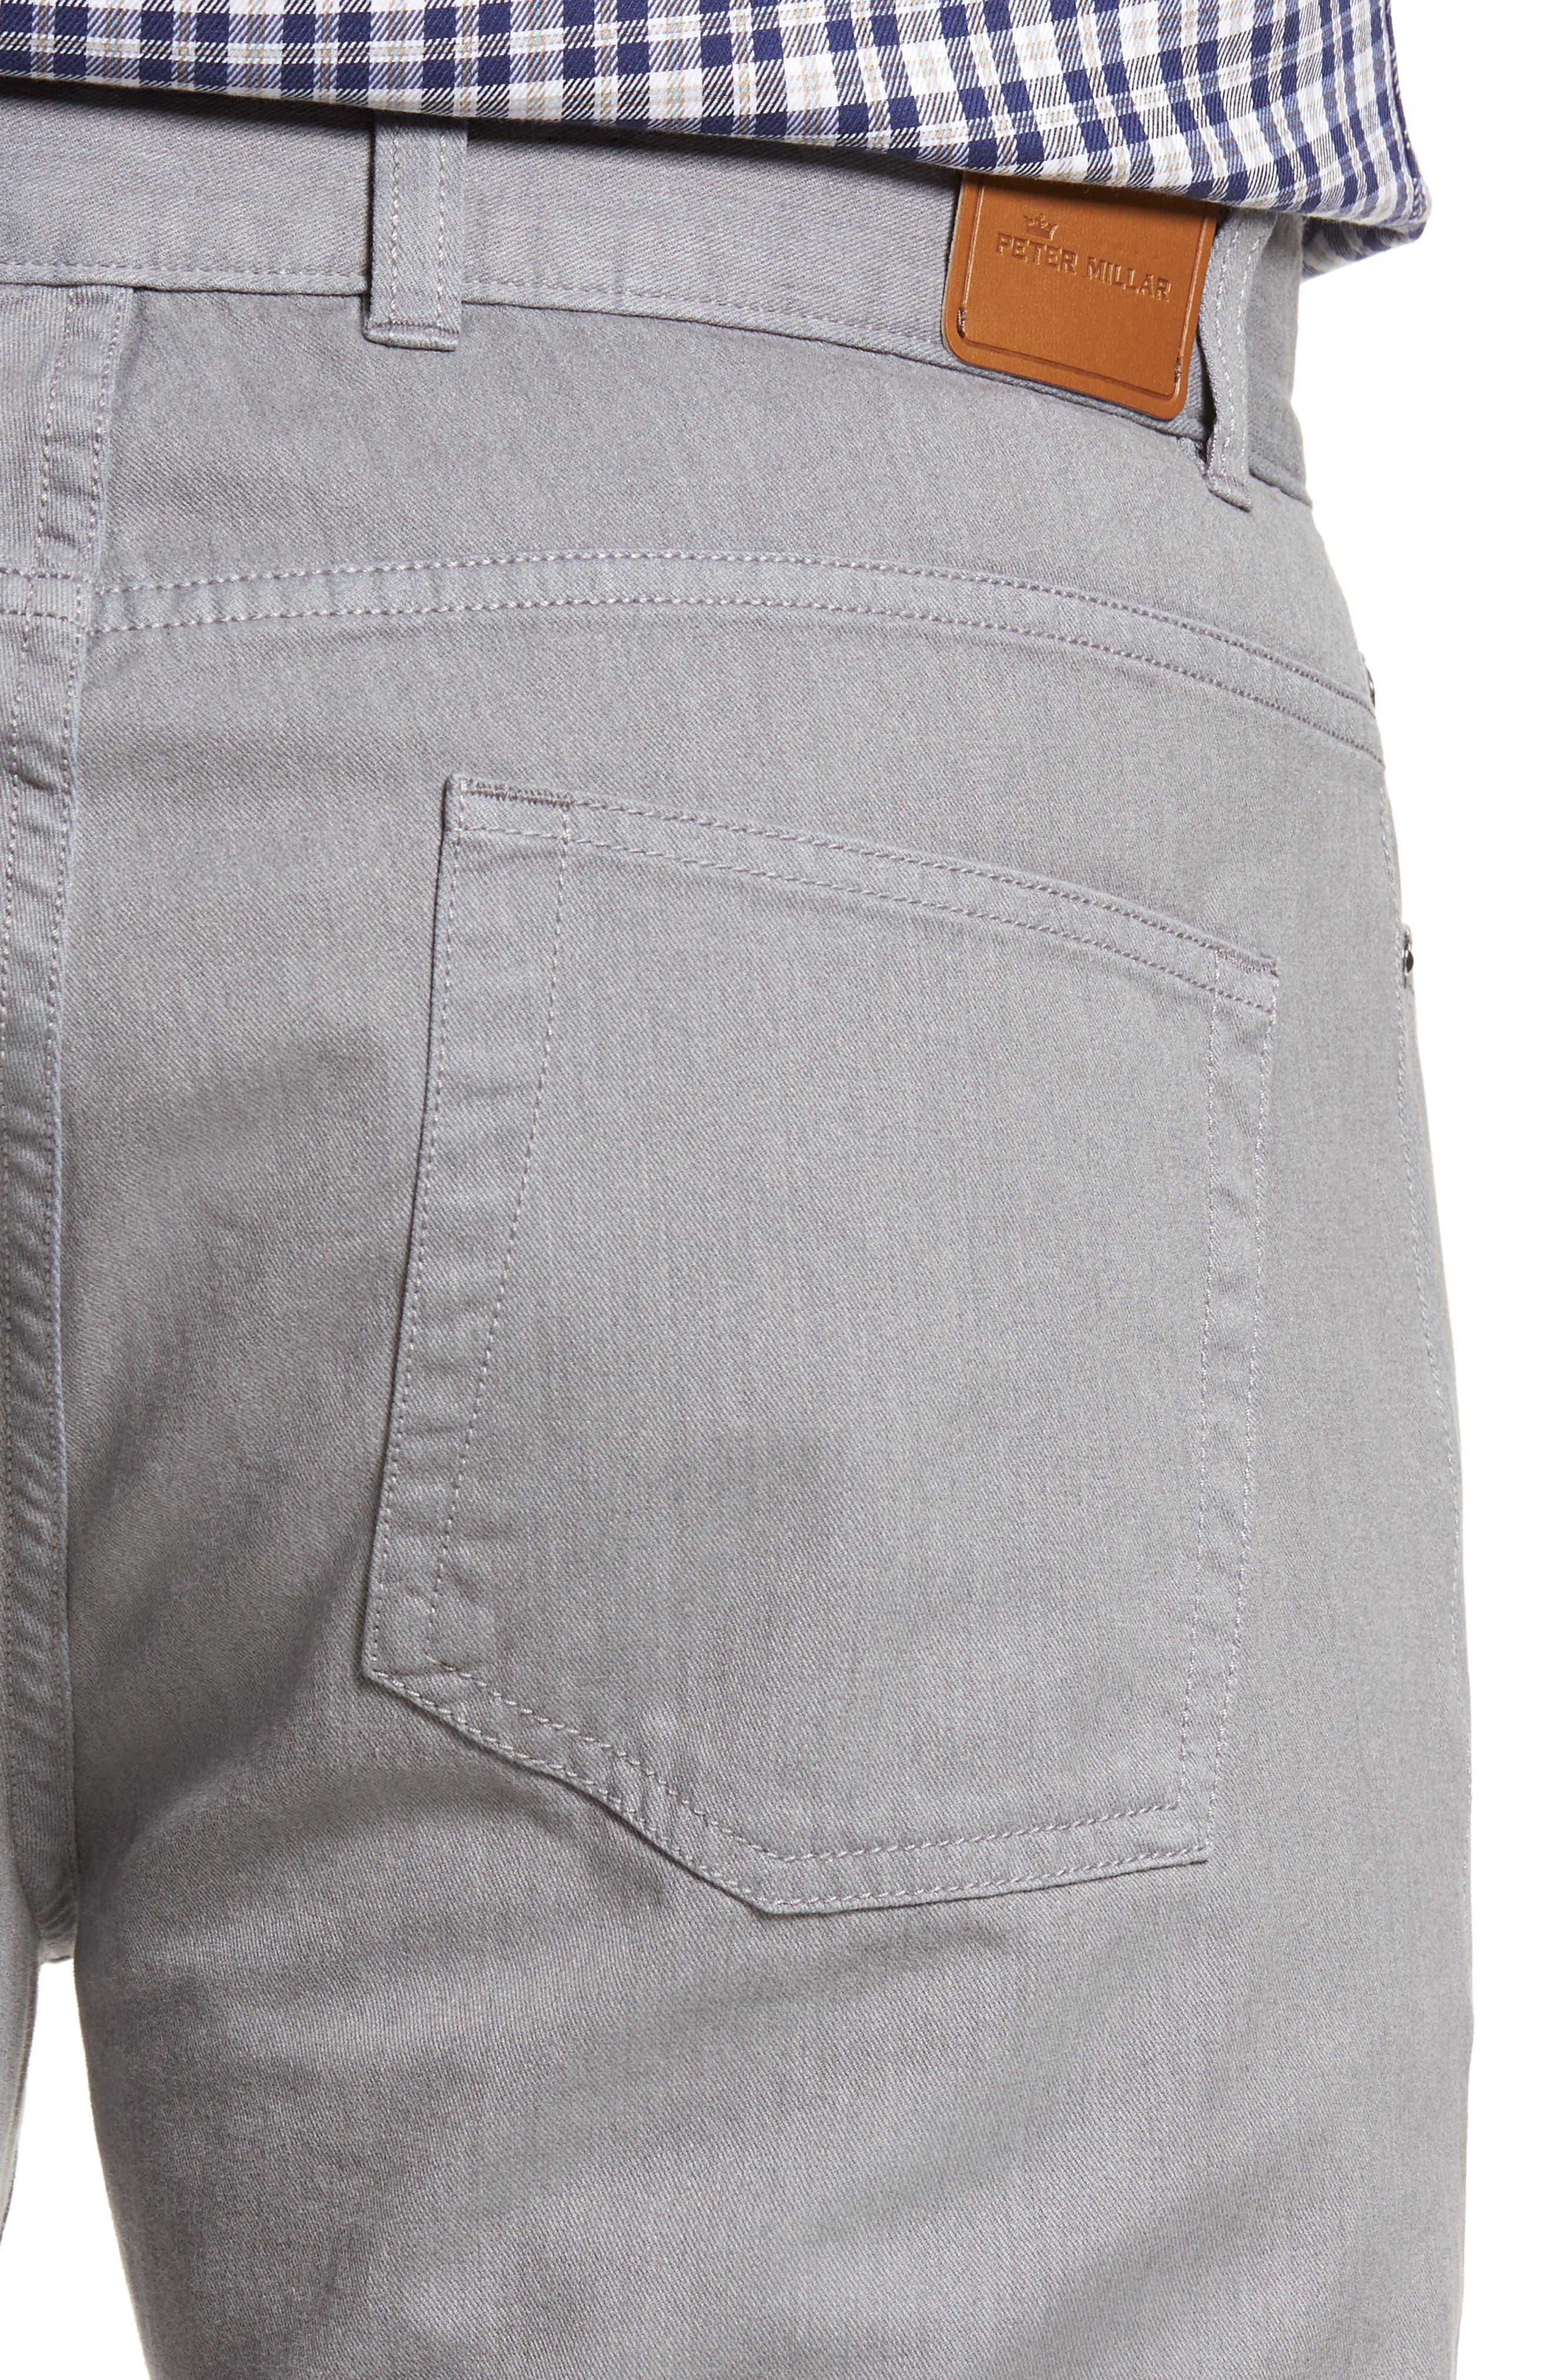 Mélange Five-Pocket Pants,                             Alternate thumbnail 4, color,                             Stingray